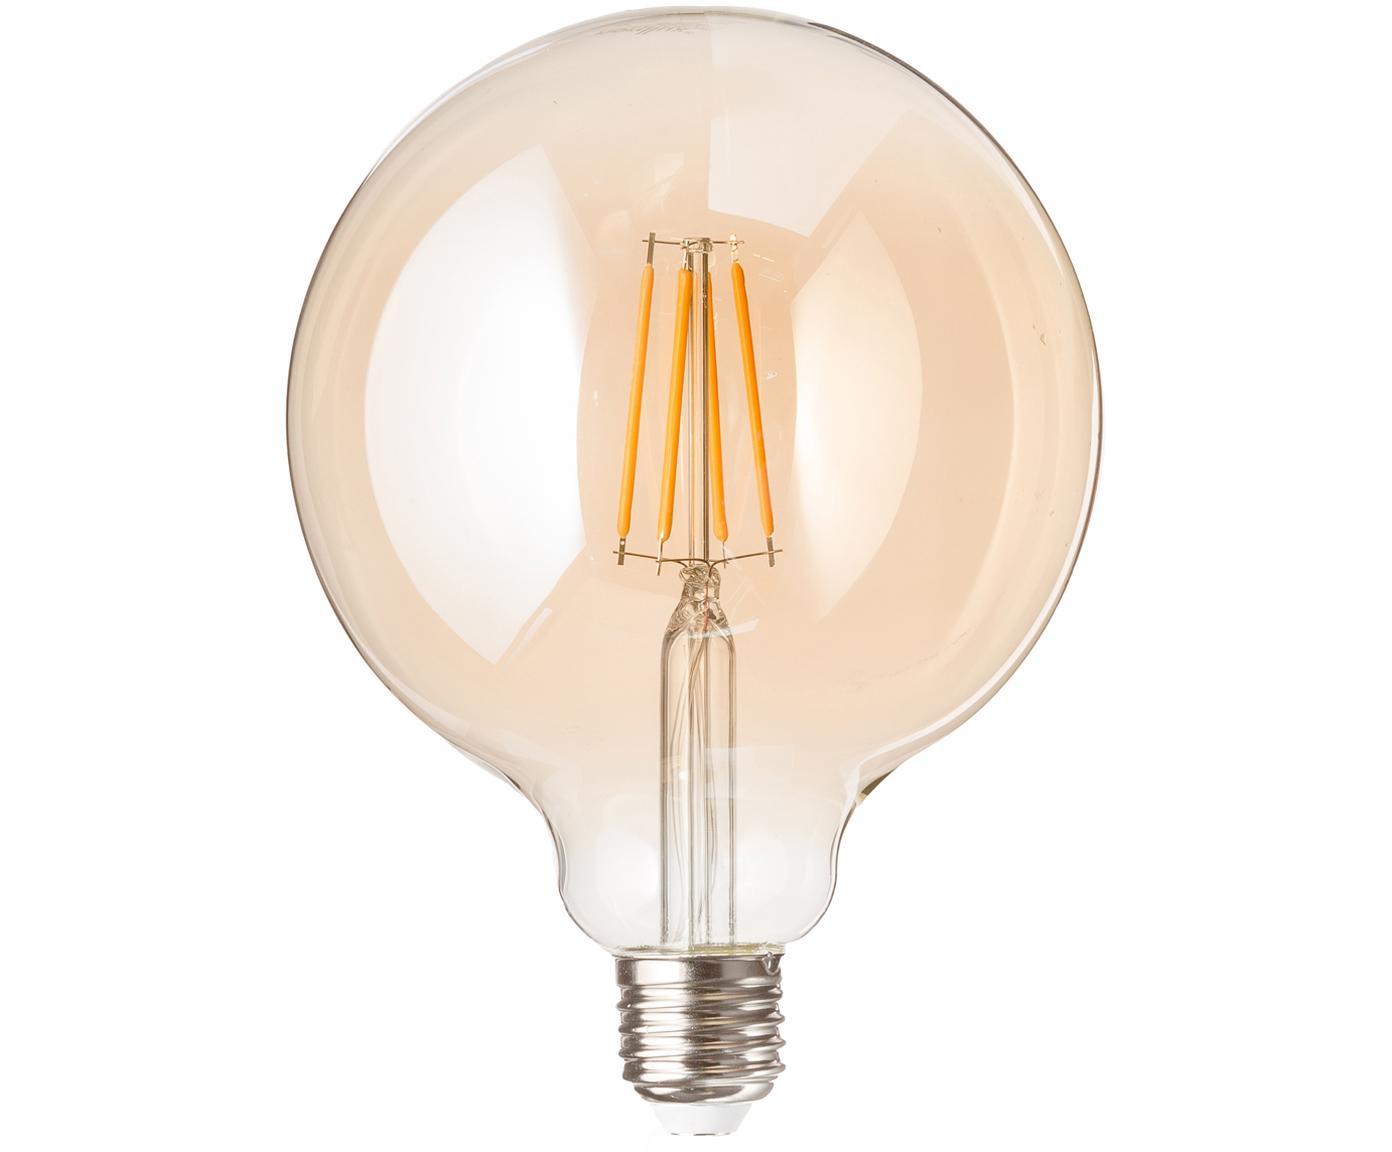 LED lamp Jukar (E27 / 1.9W) 2 stuks, Peertje: glas, Fitting: aluminium, Amberkleurig, Ø 12 x H 18 cm